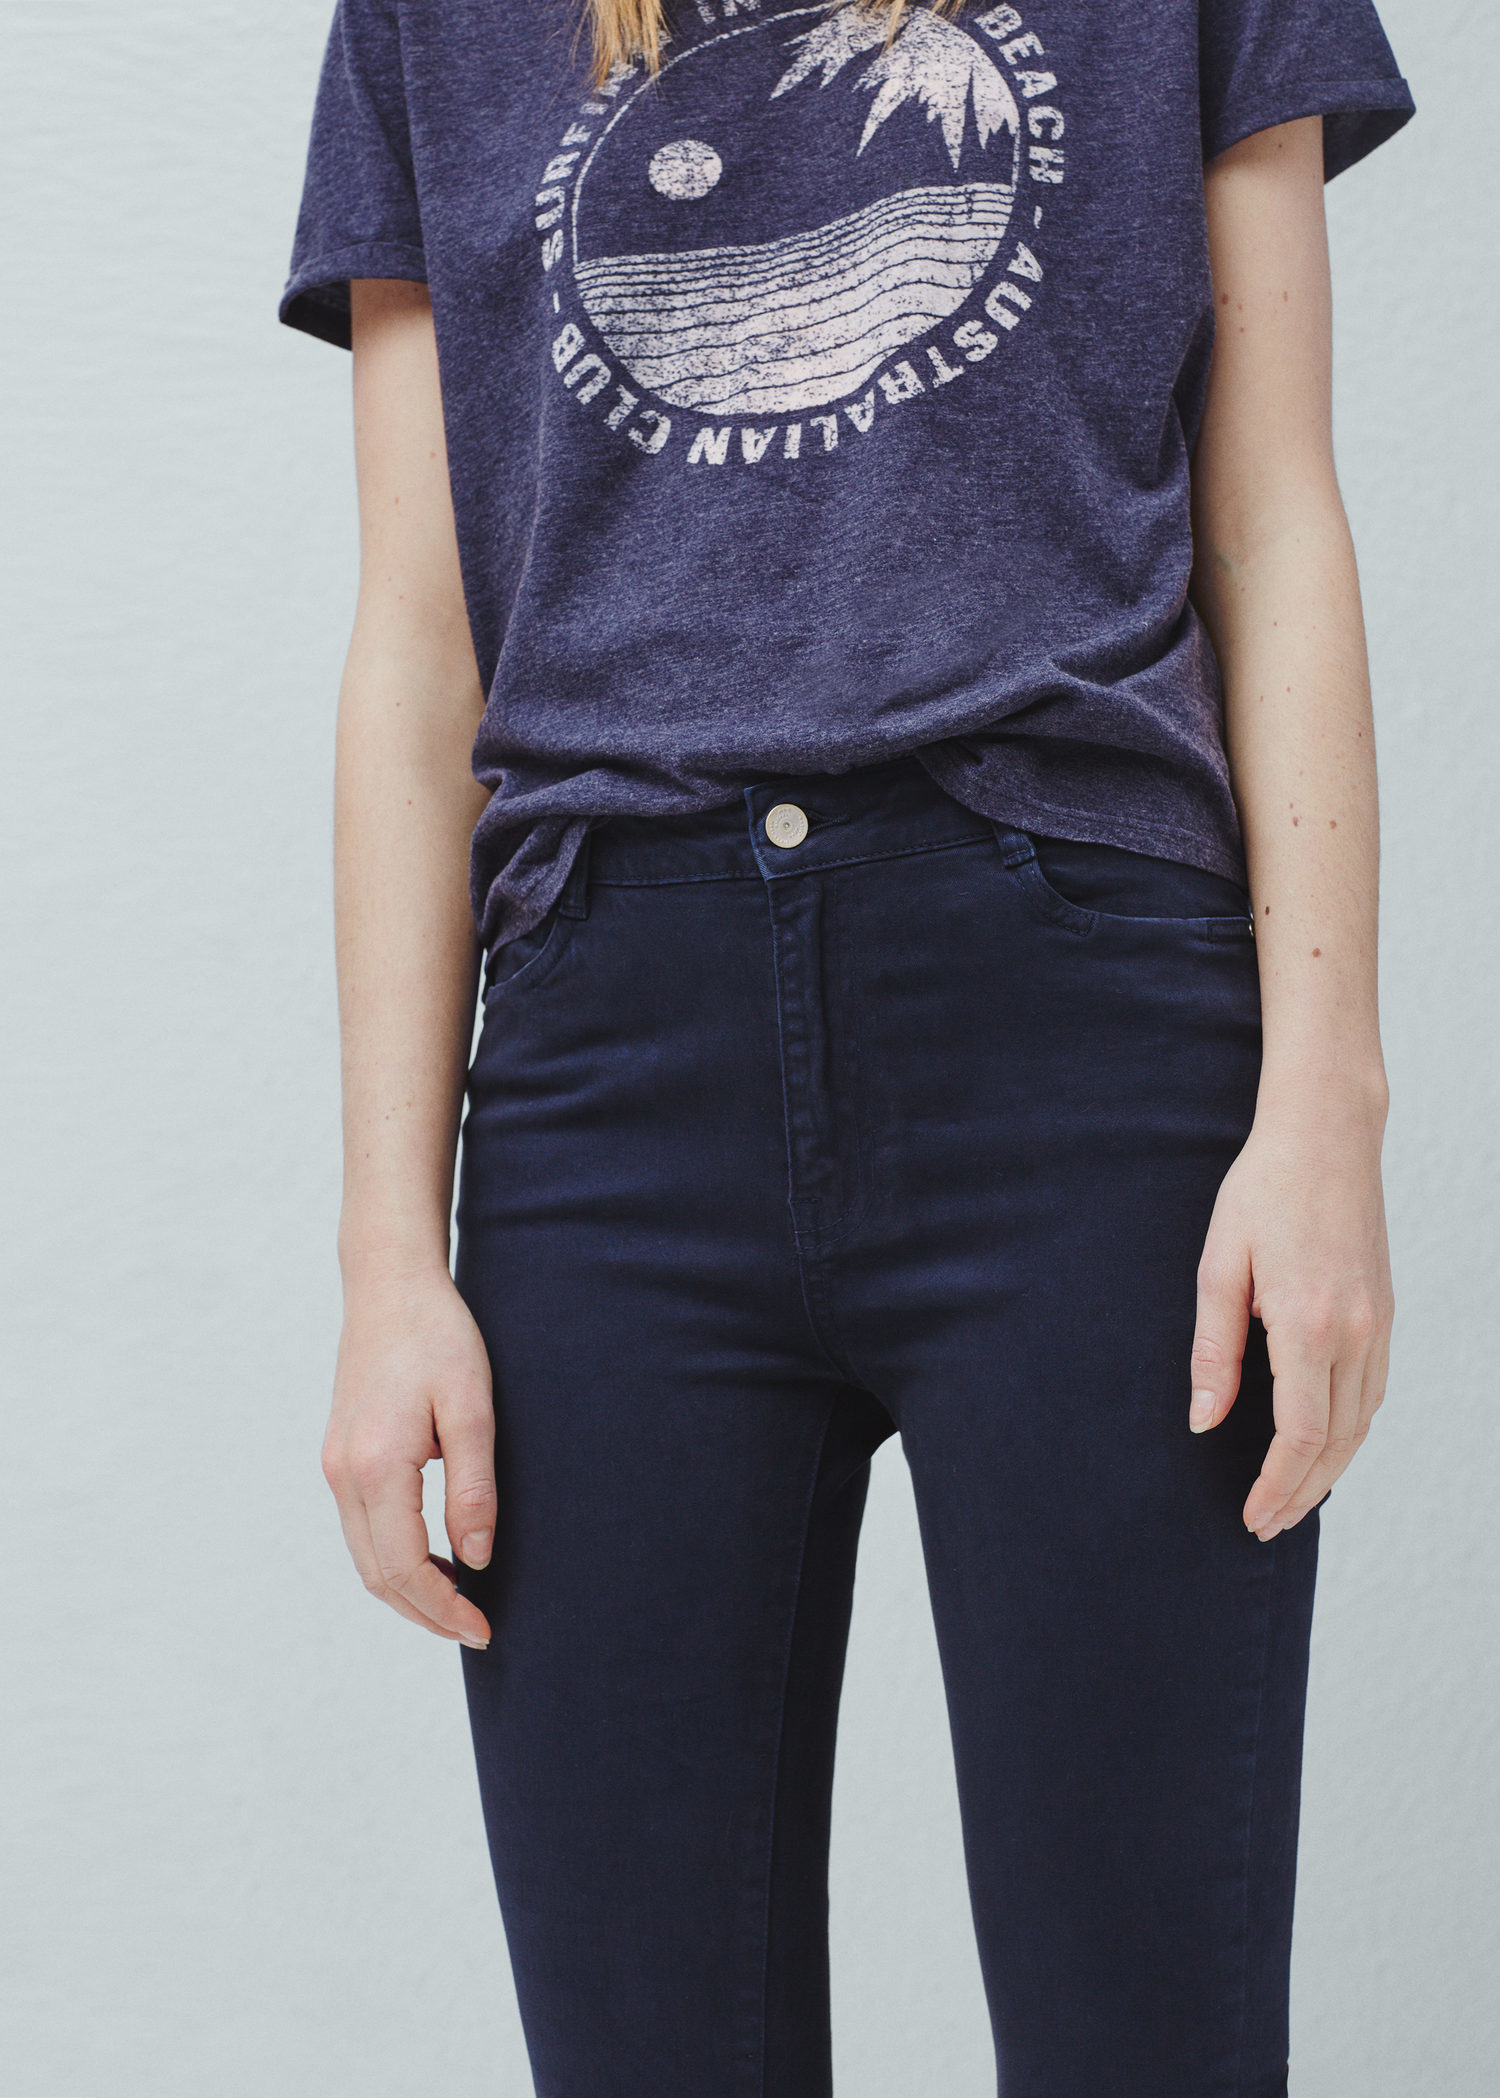 Mango High Waist Skinny Jeans in Blue